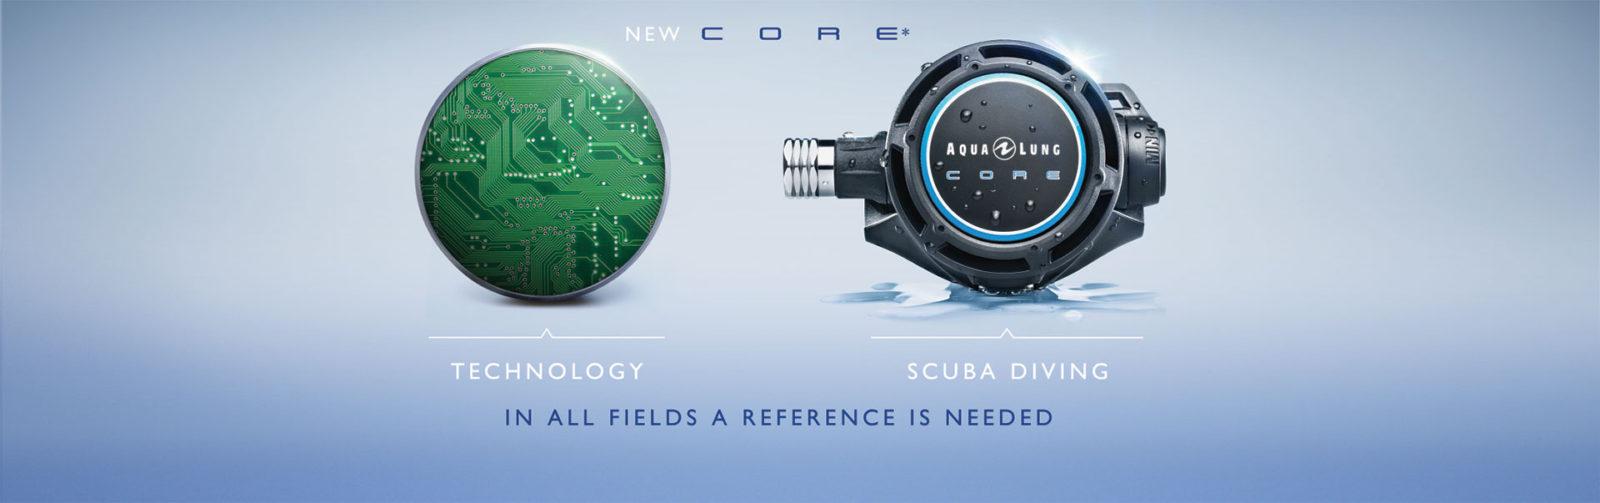 Aqualung Core regulator